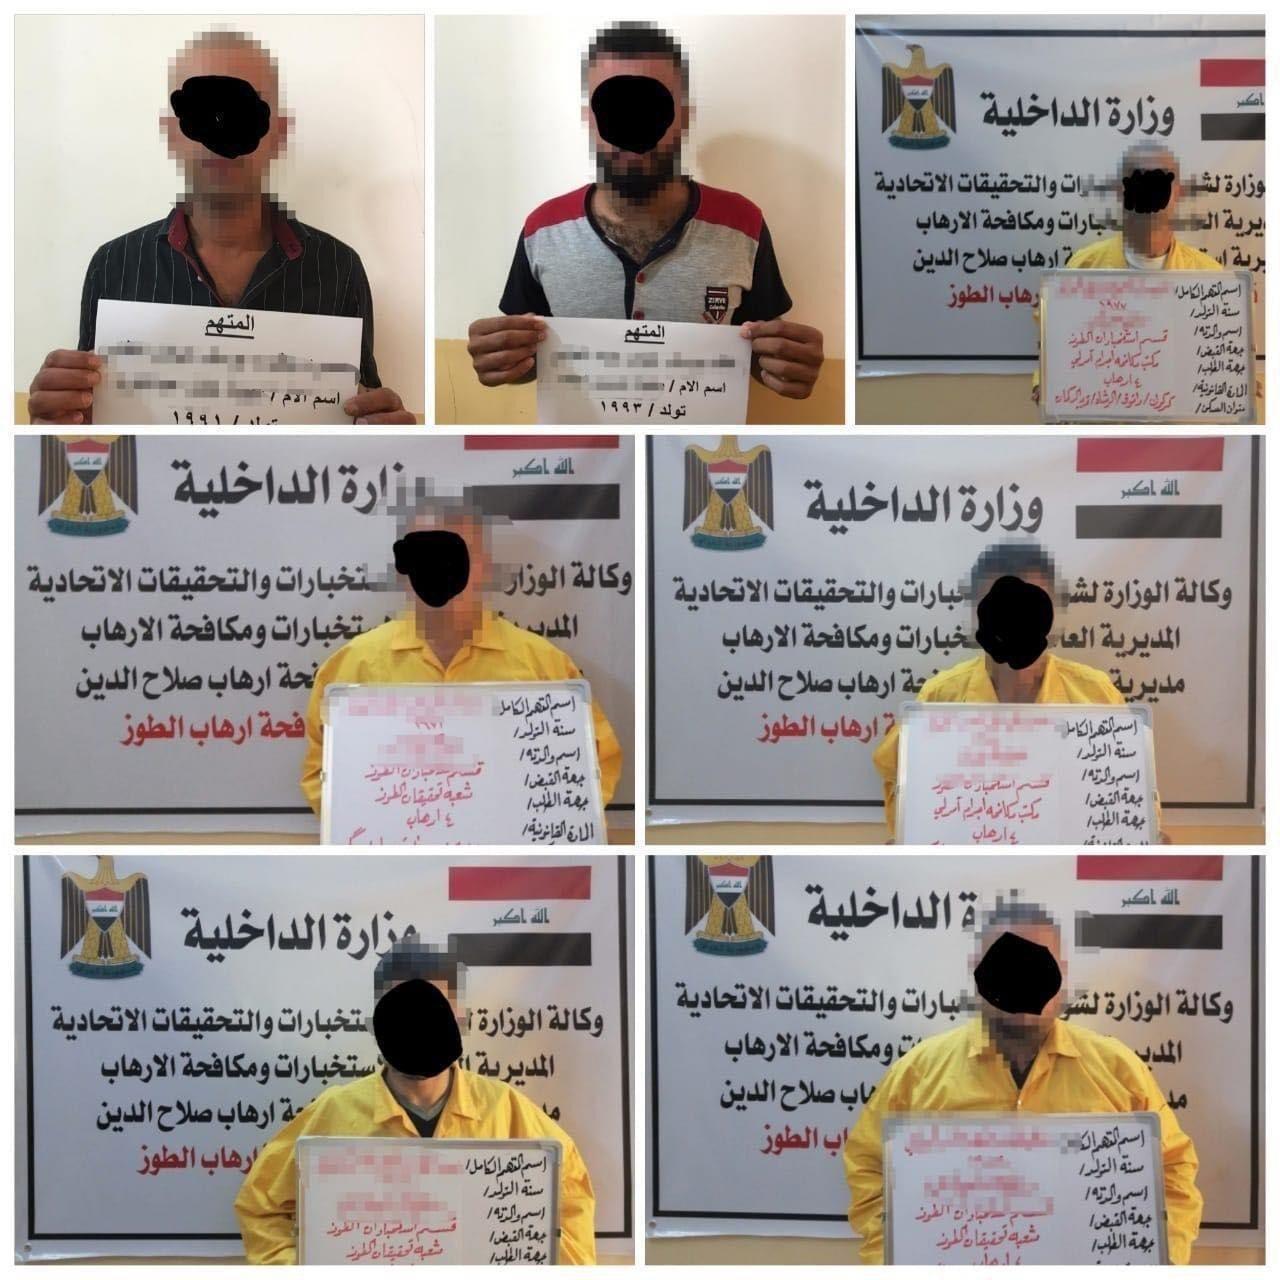 Photo of الداخلية العراقية القبض على 7 إرهابيين في صلاح الدين